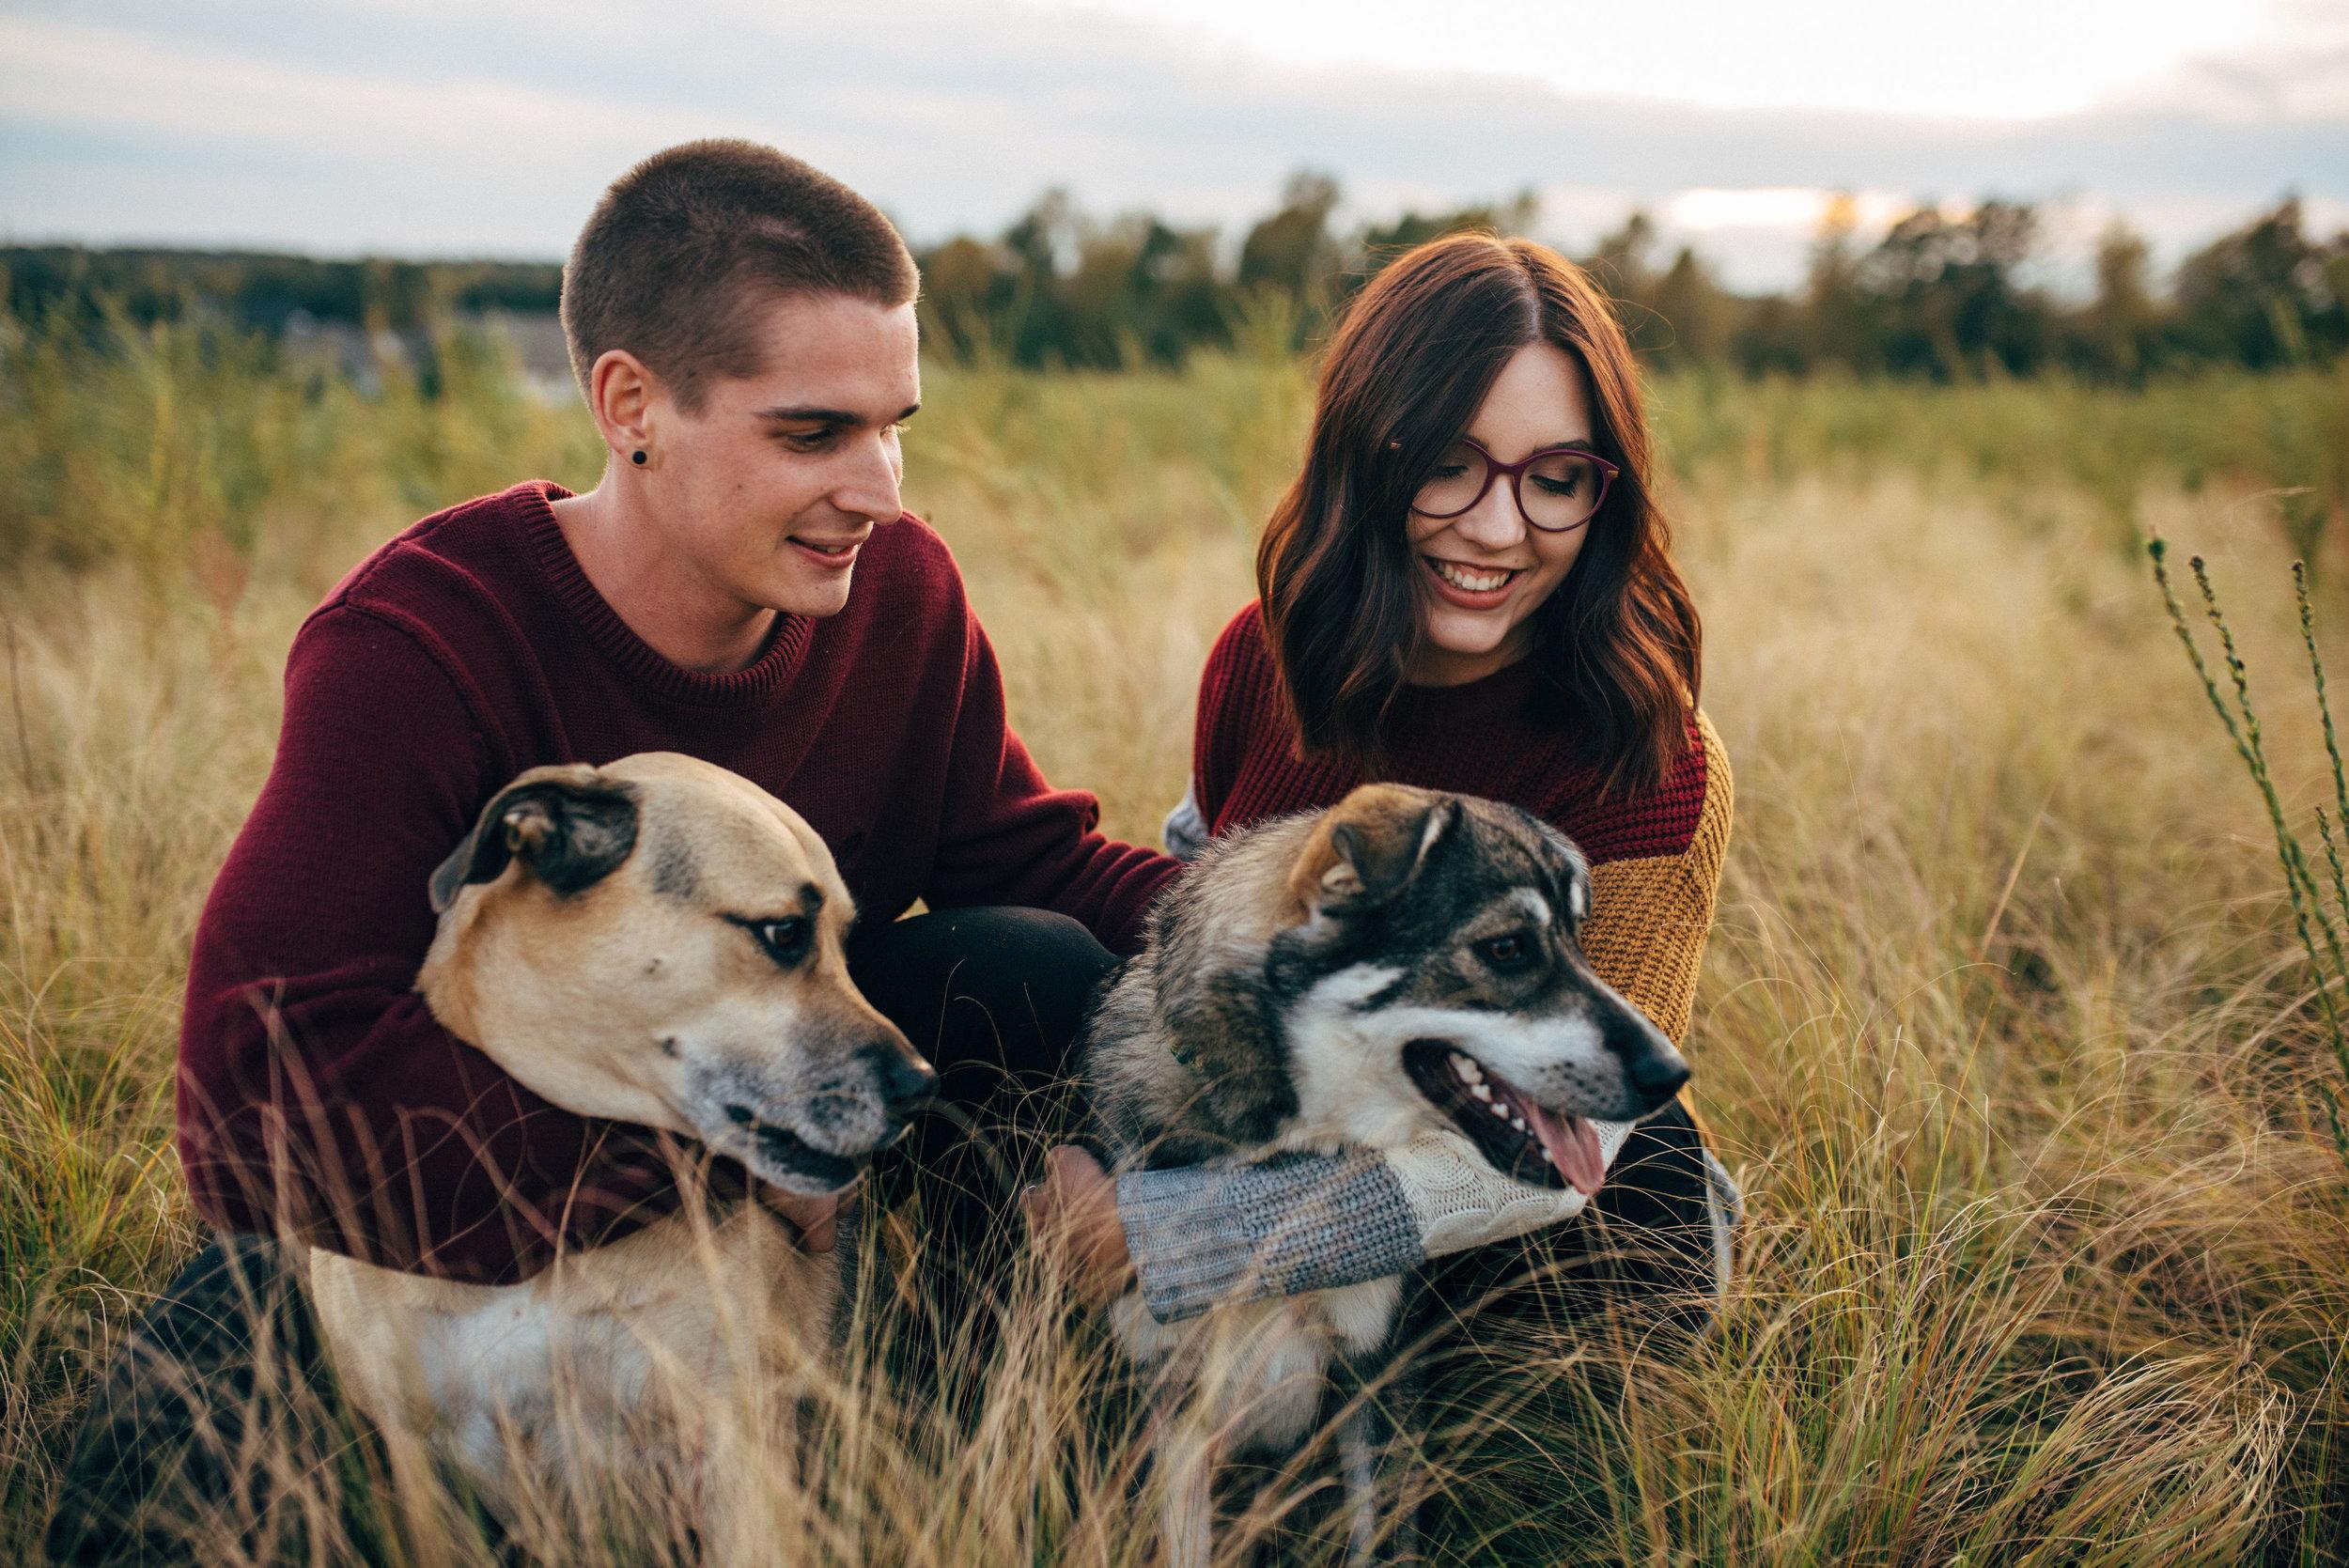 raleigh wedding photographer - north carolina wedding photographer - couple session with dogs